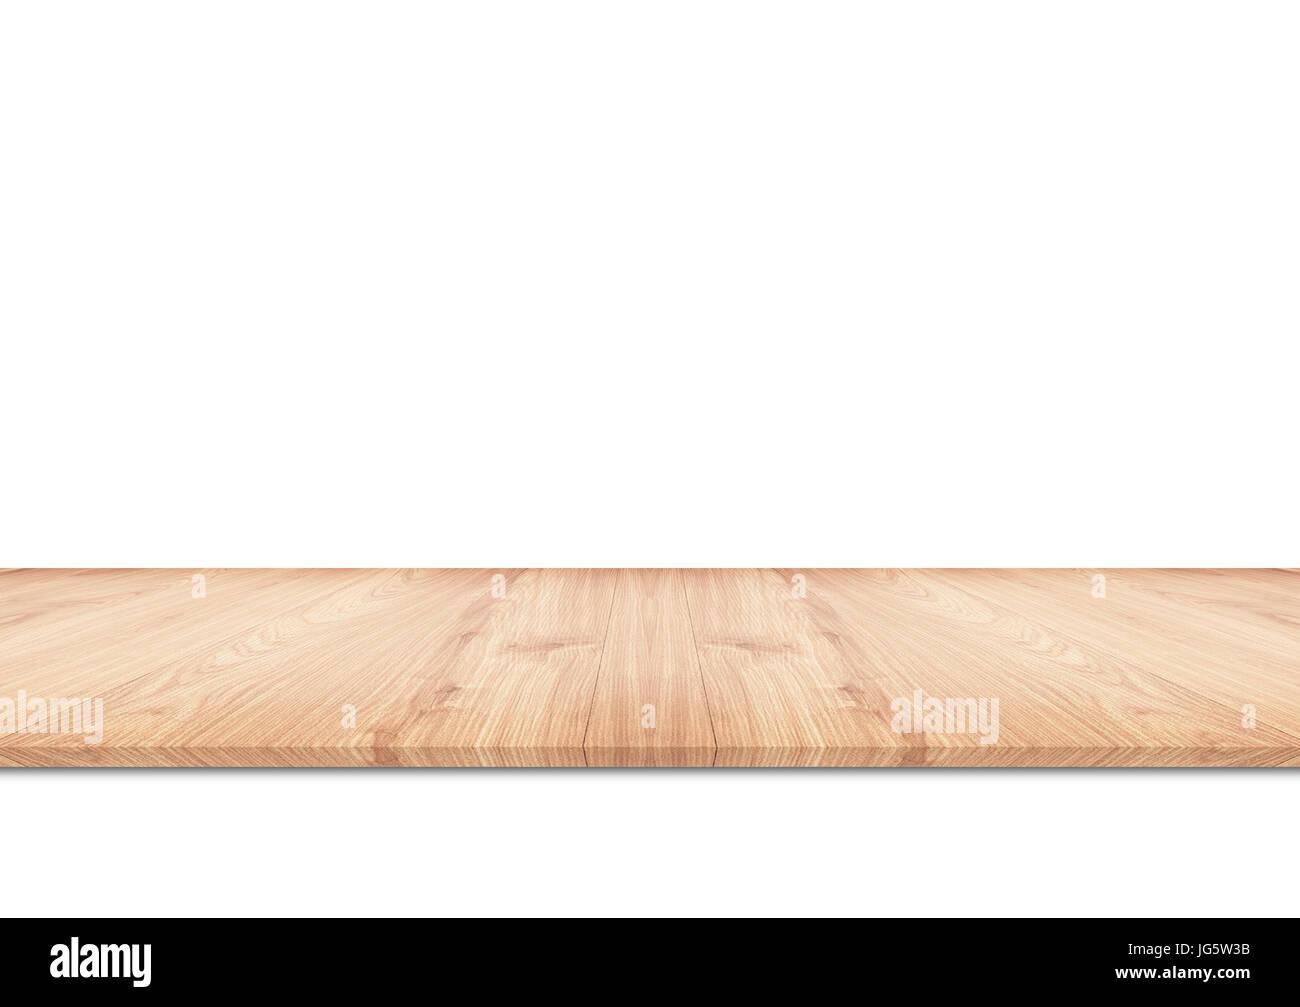 Wood Counter Stockfotos & Wood Counter Bilder - Alamy